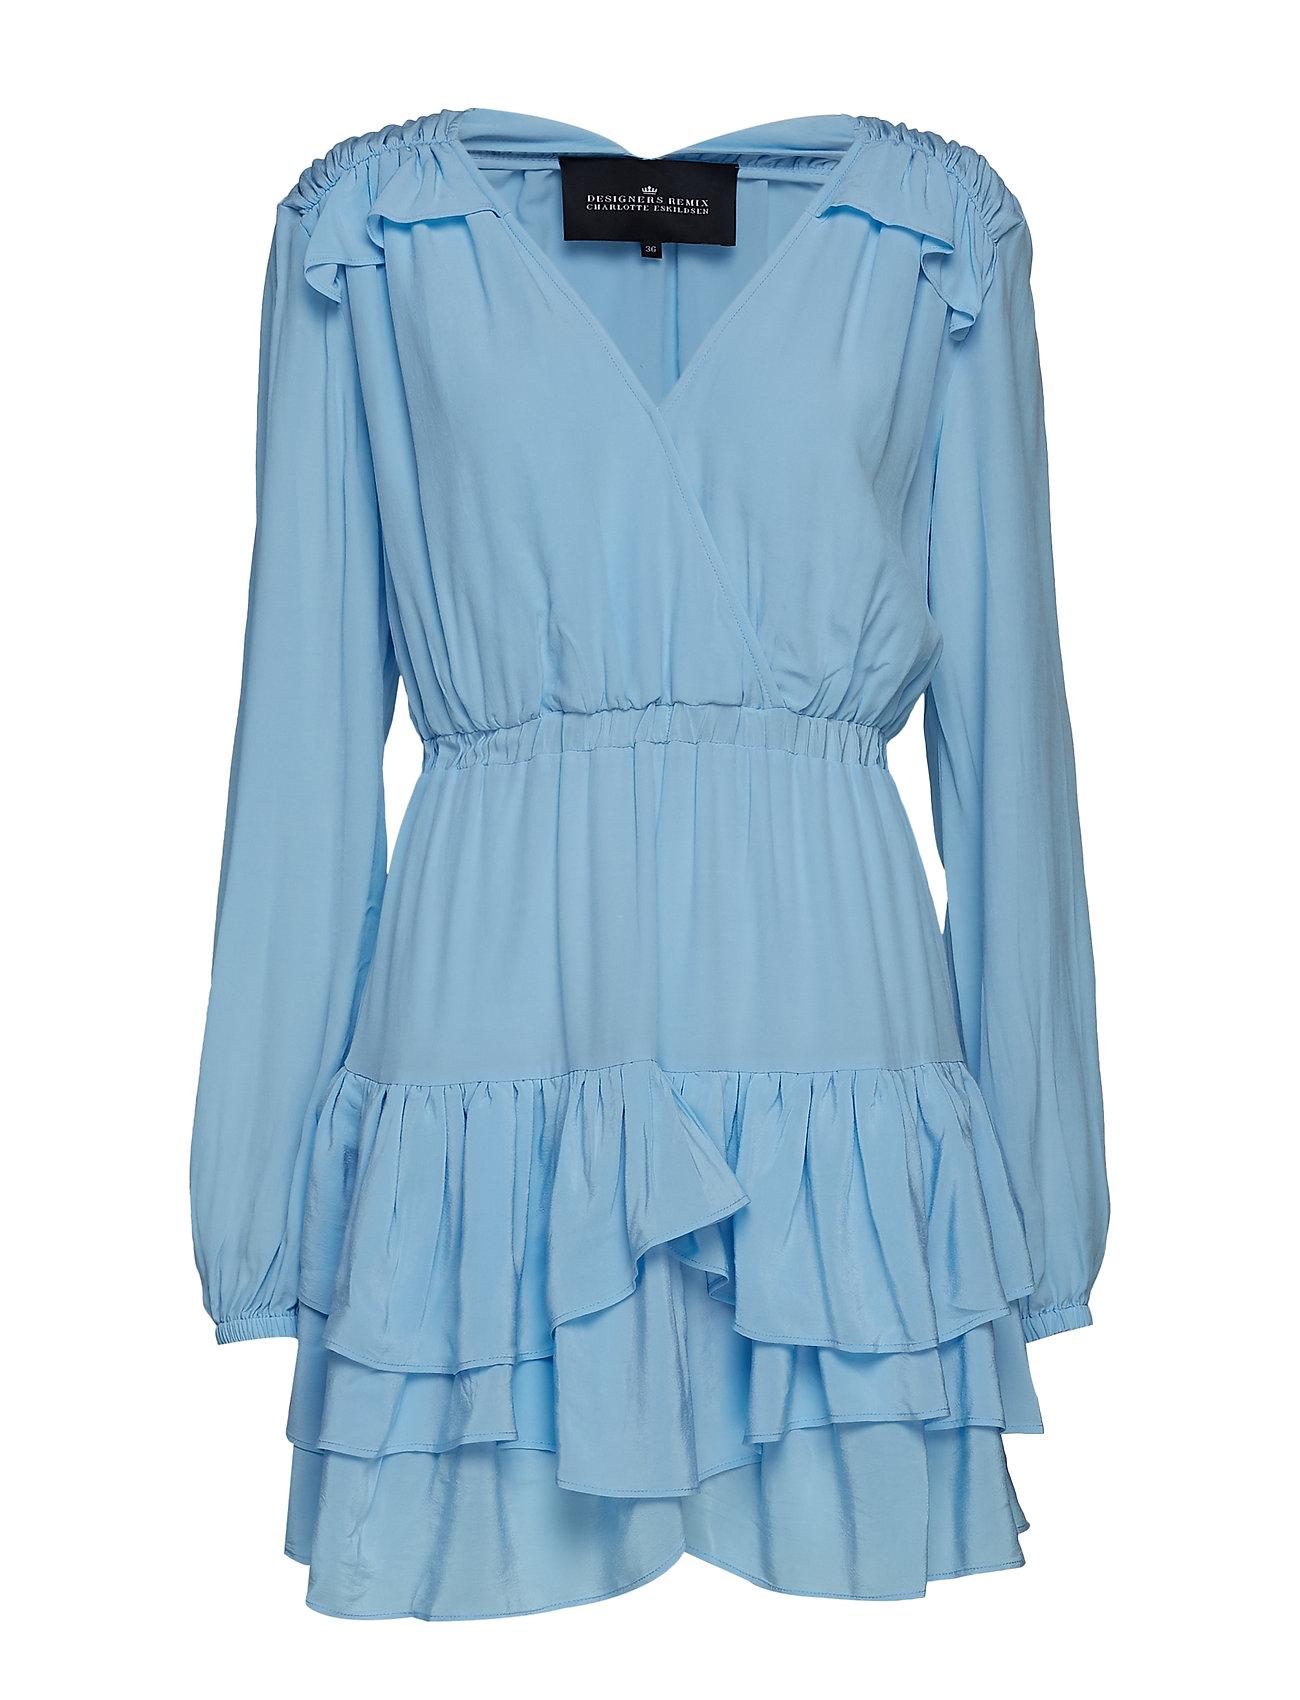 DESIGNERS, REMIX Nini Ruffle Dress - SKY BLUE